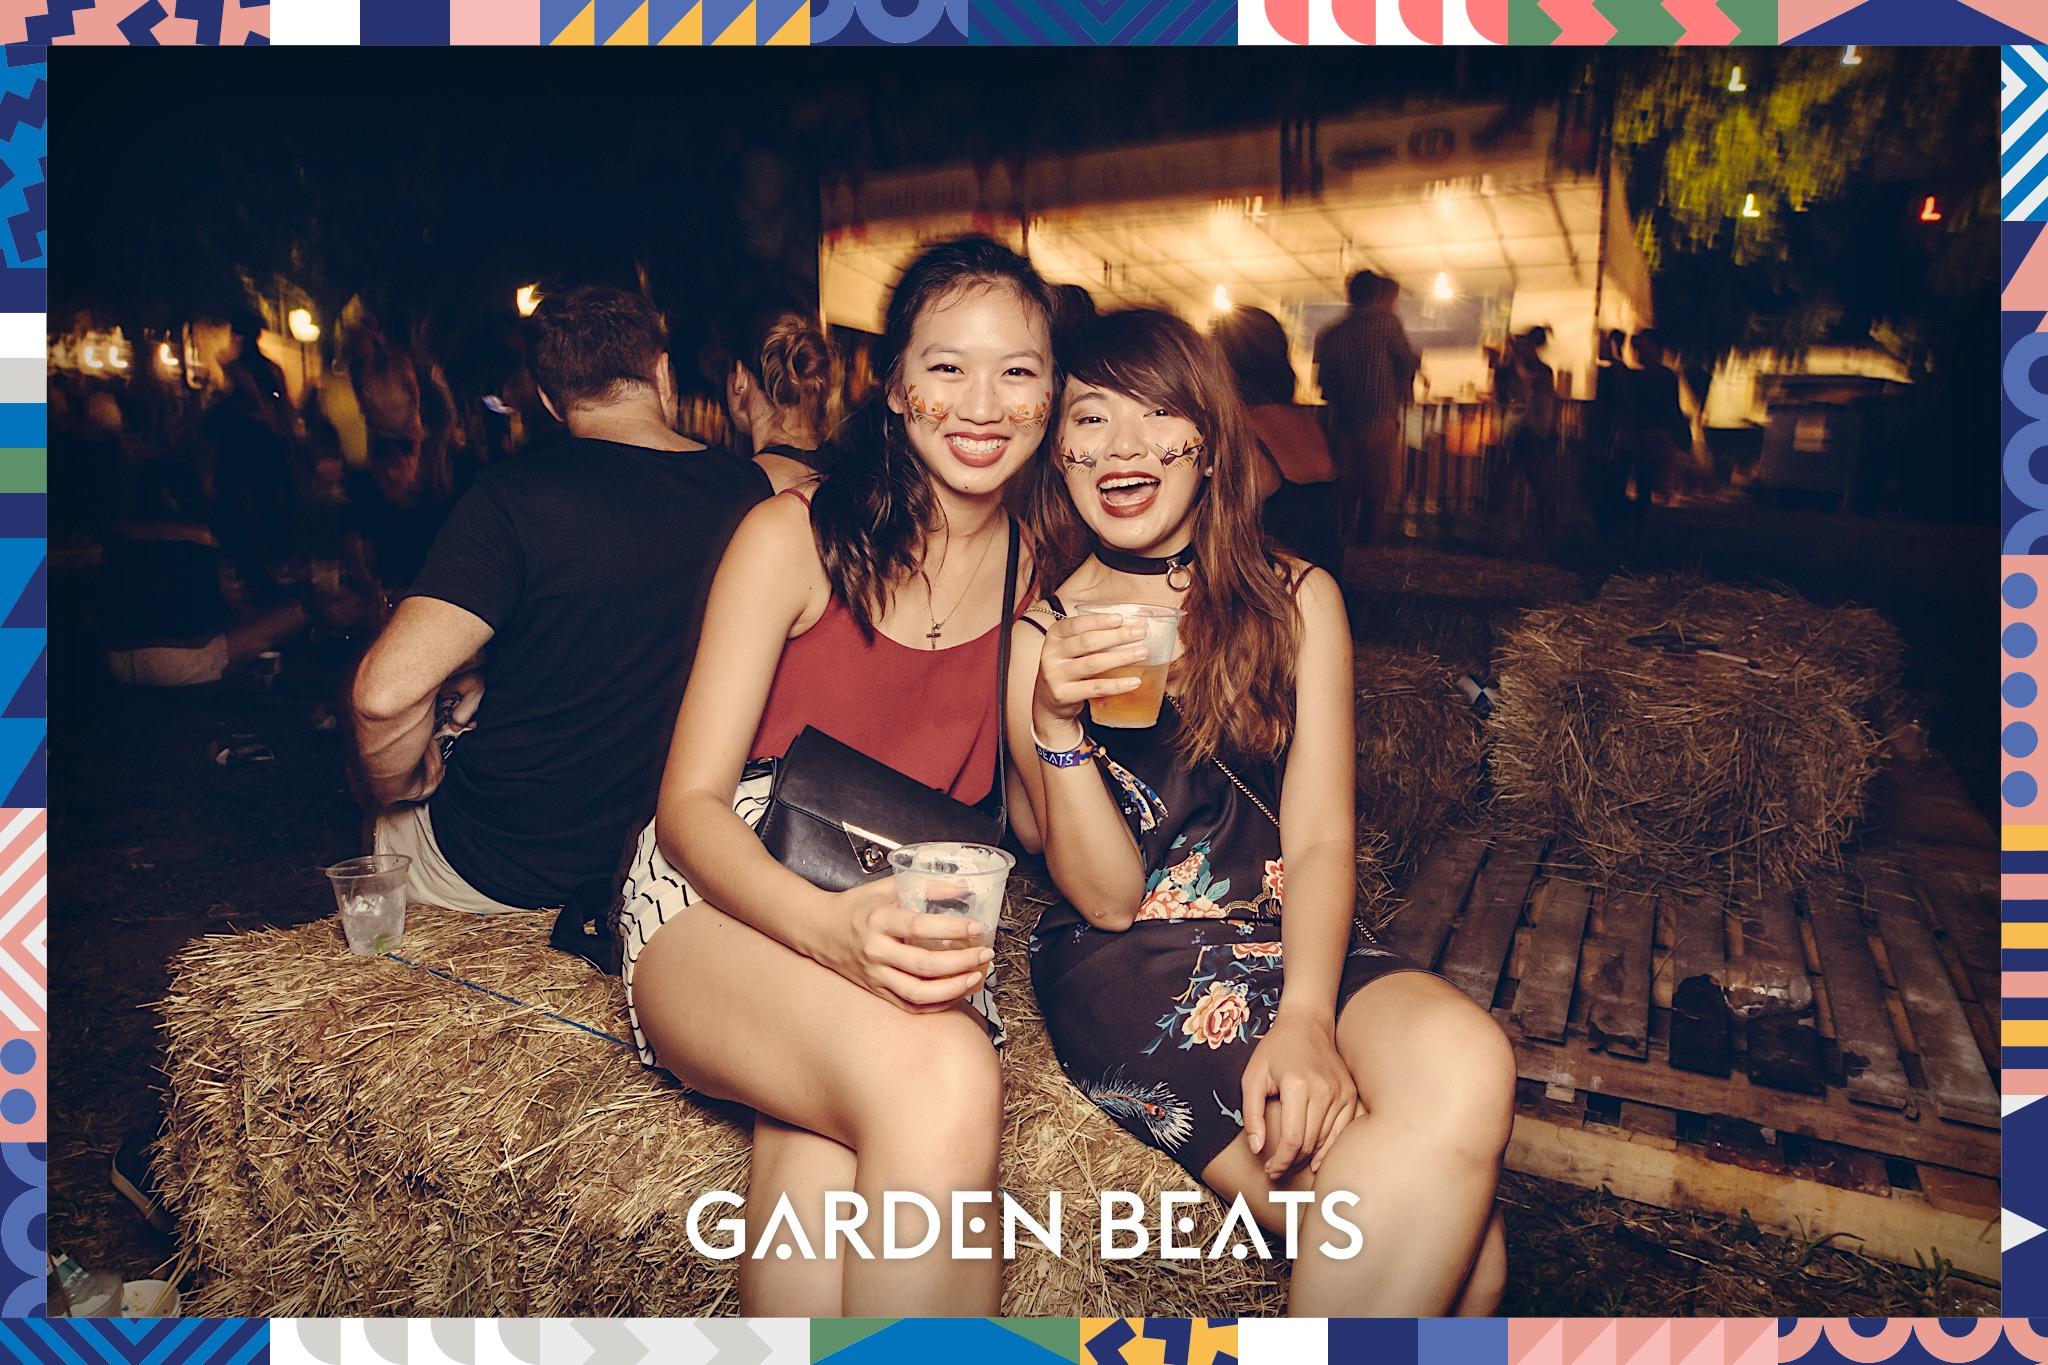 18032017_GardenBeats_Colossal852_WatermarkedGB.jpg